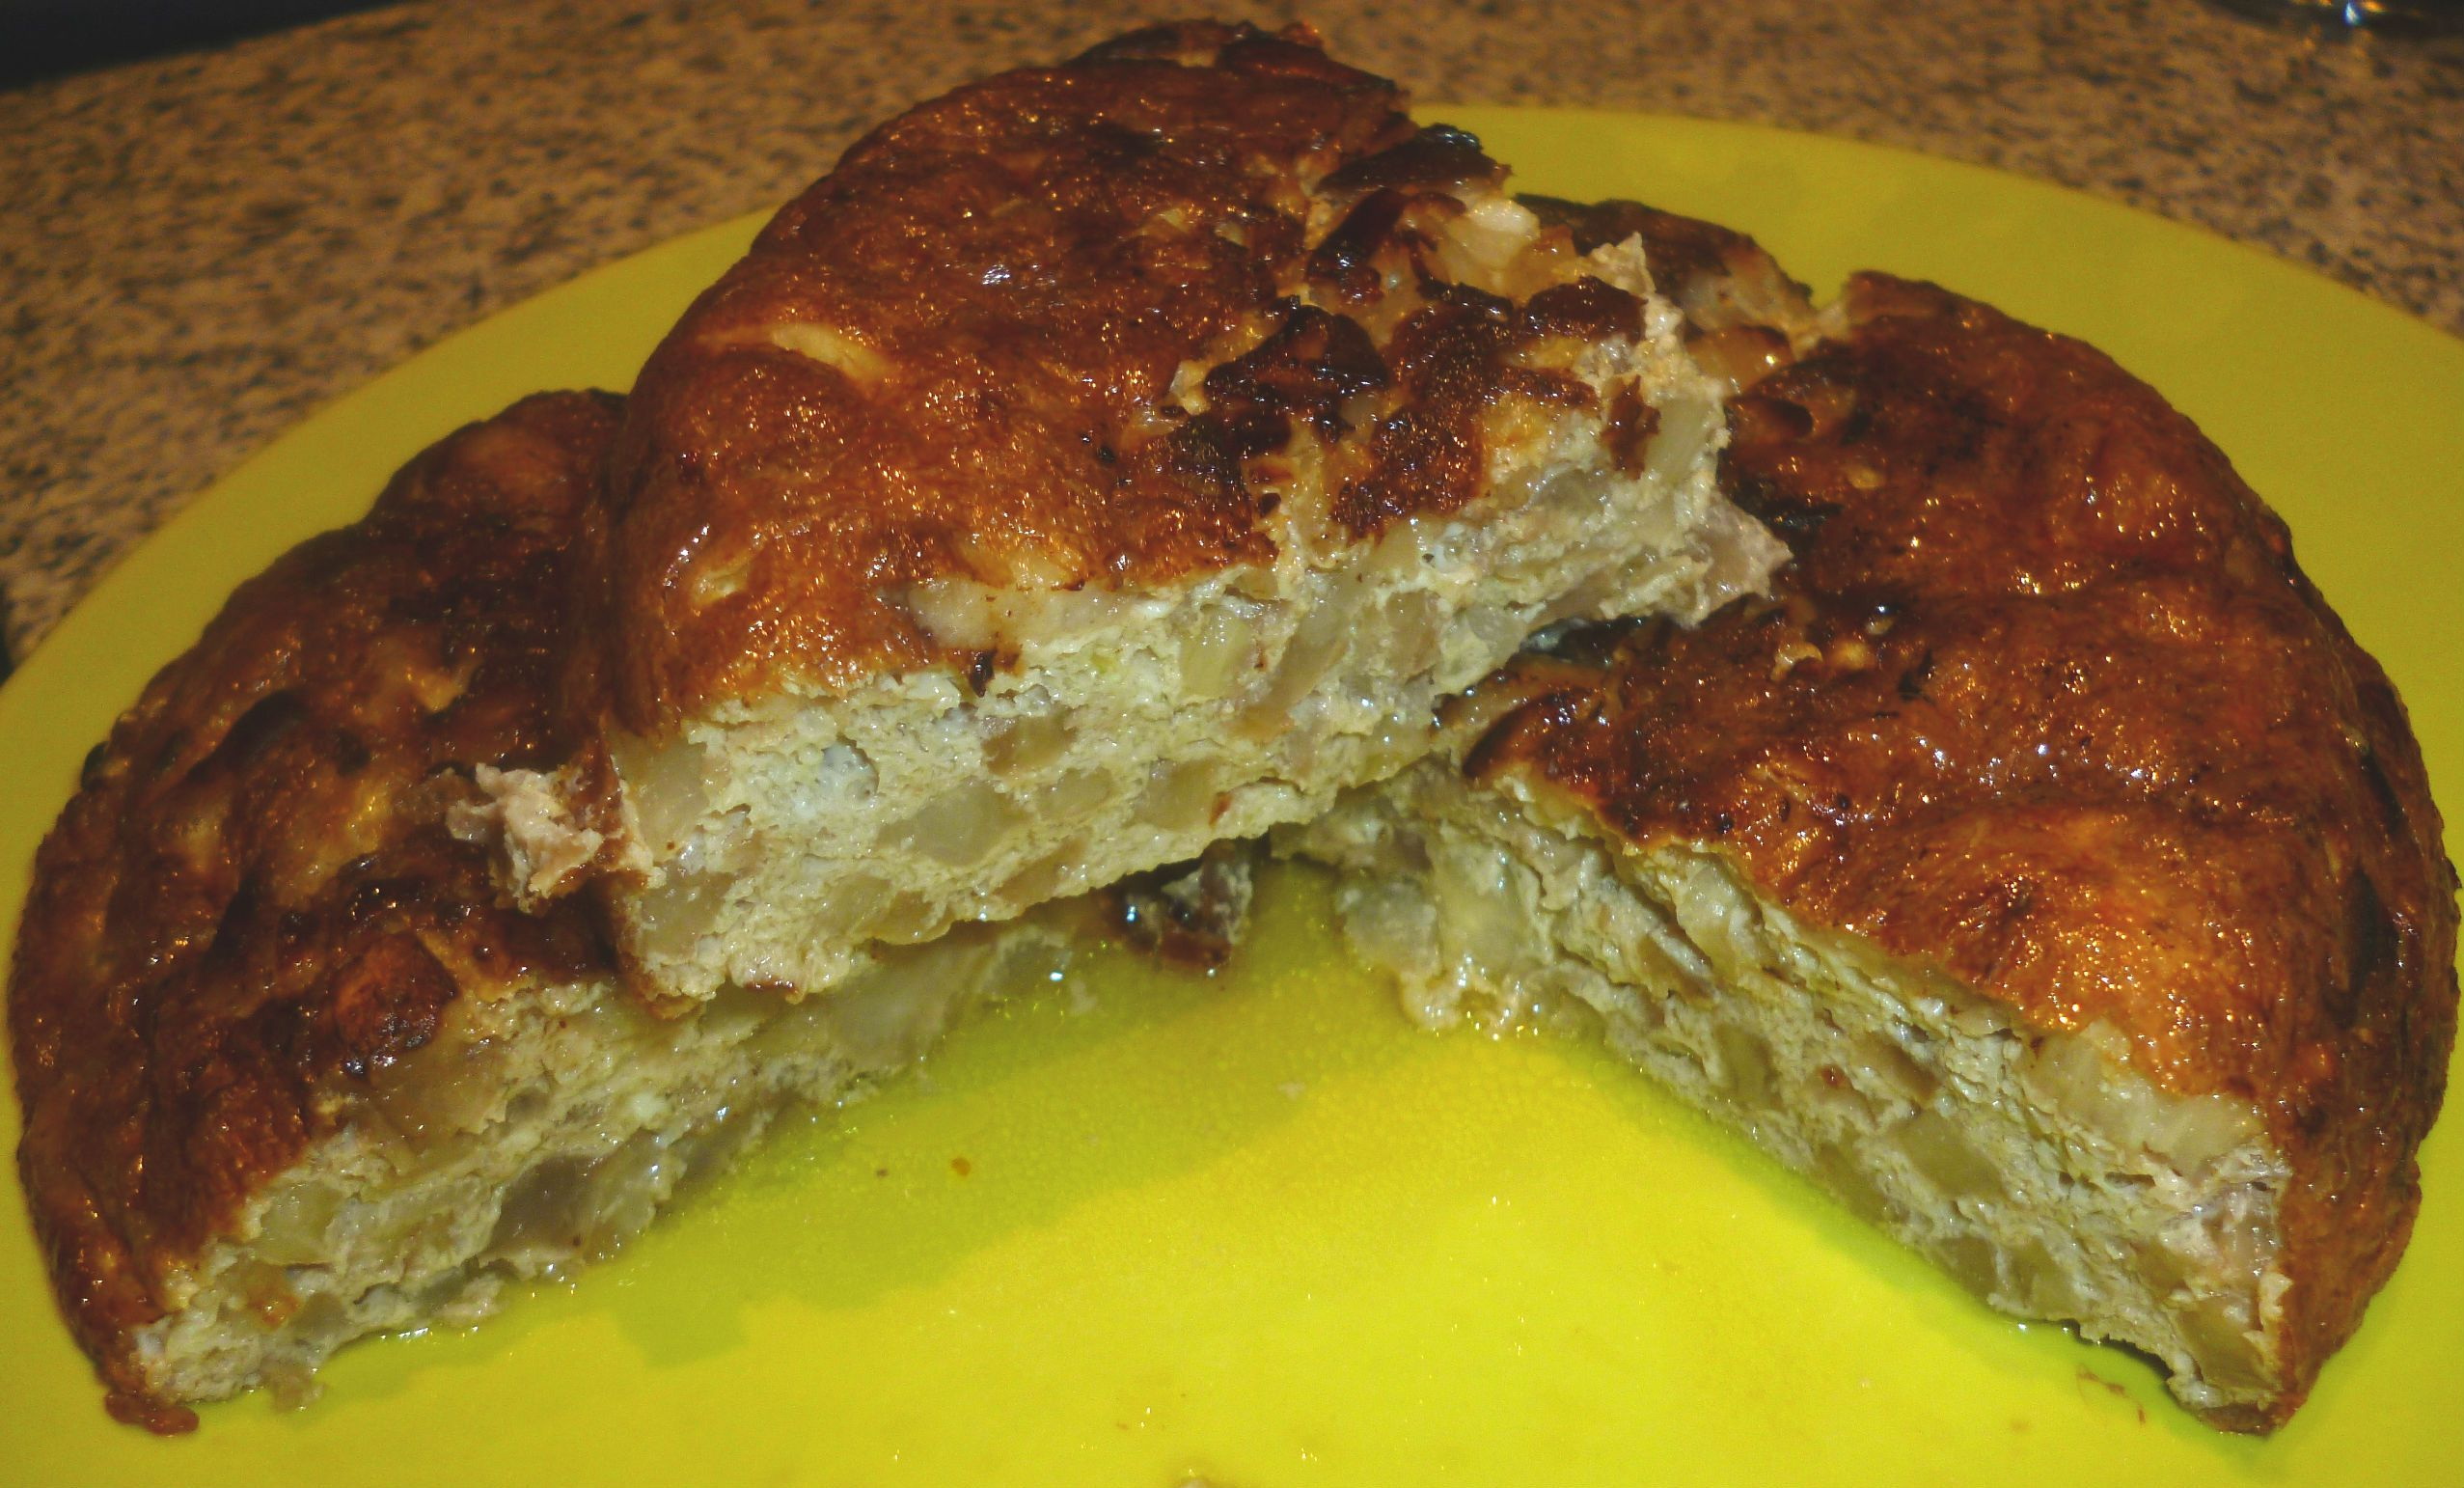 Tortilla de berenjenas que nos envió Mireia Nogué. La receta la encontraréis en nuestra web oficial: http://www.chefplus.es/receta/tortilla-de-berenjenas o en la pág. 118 del recetario oficial.